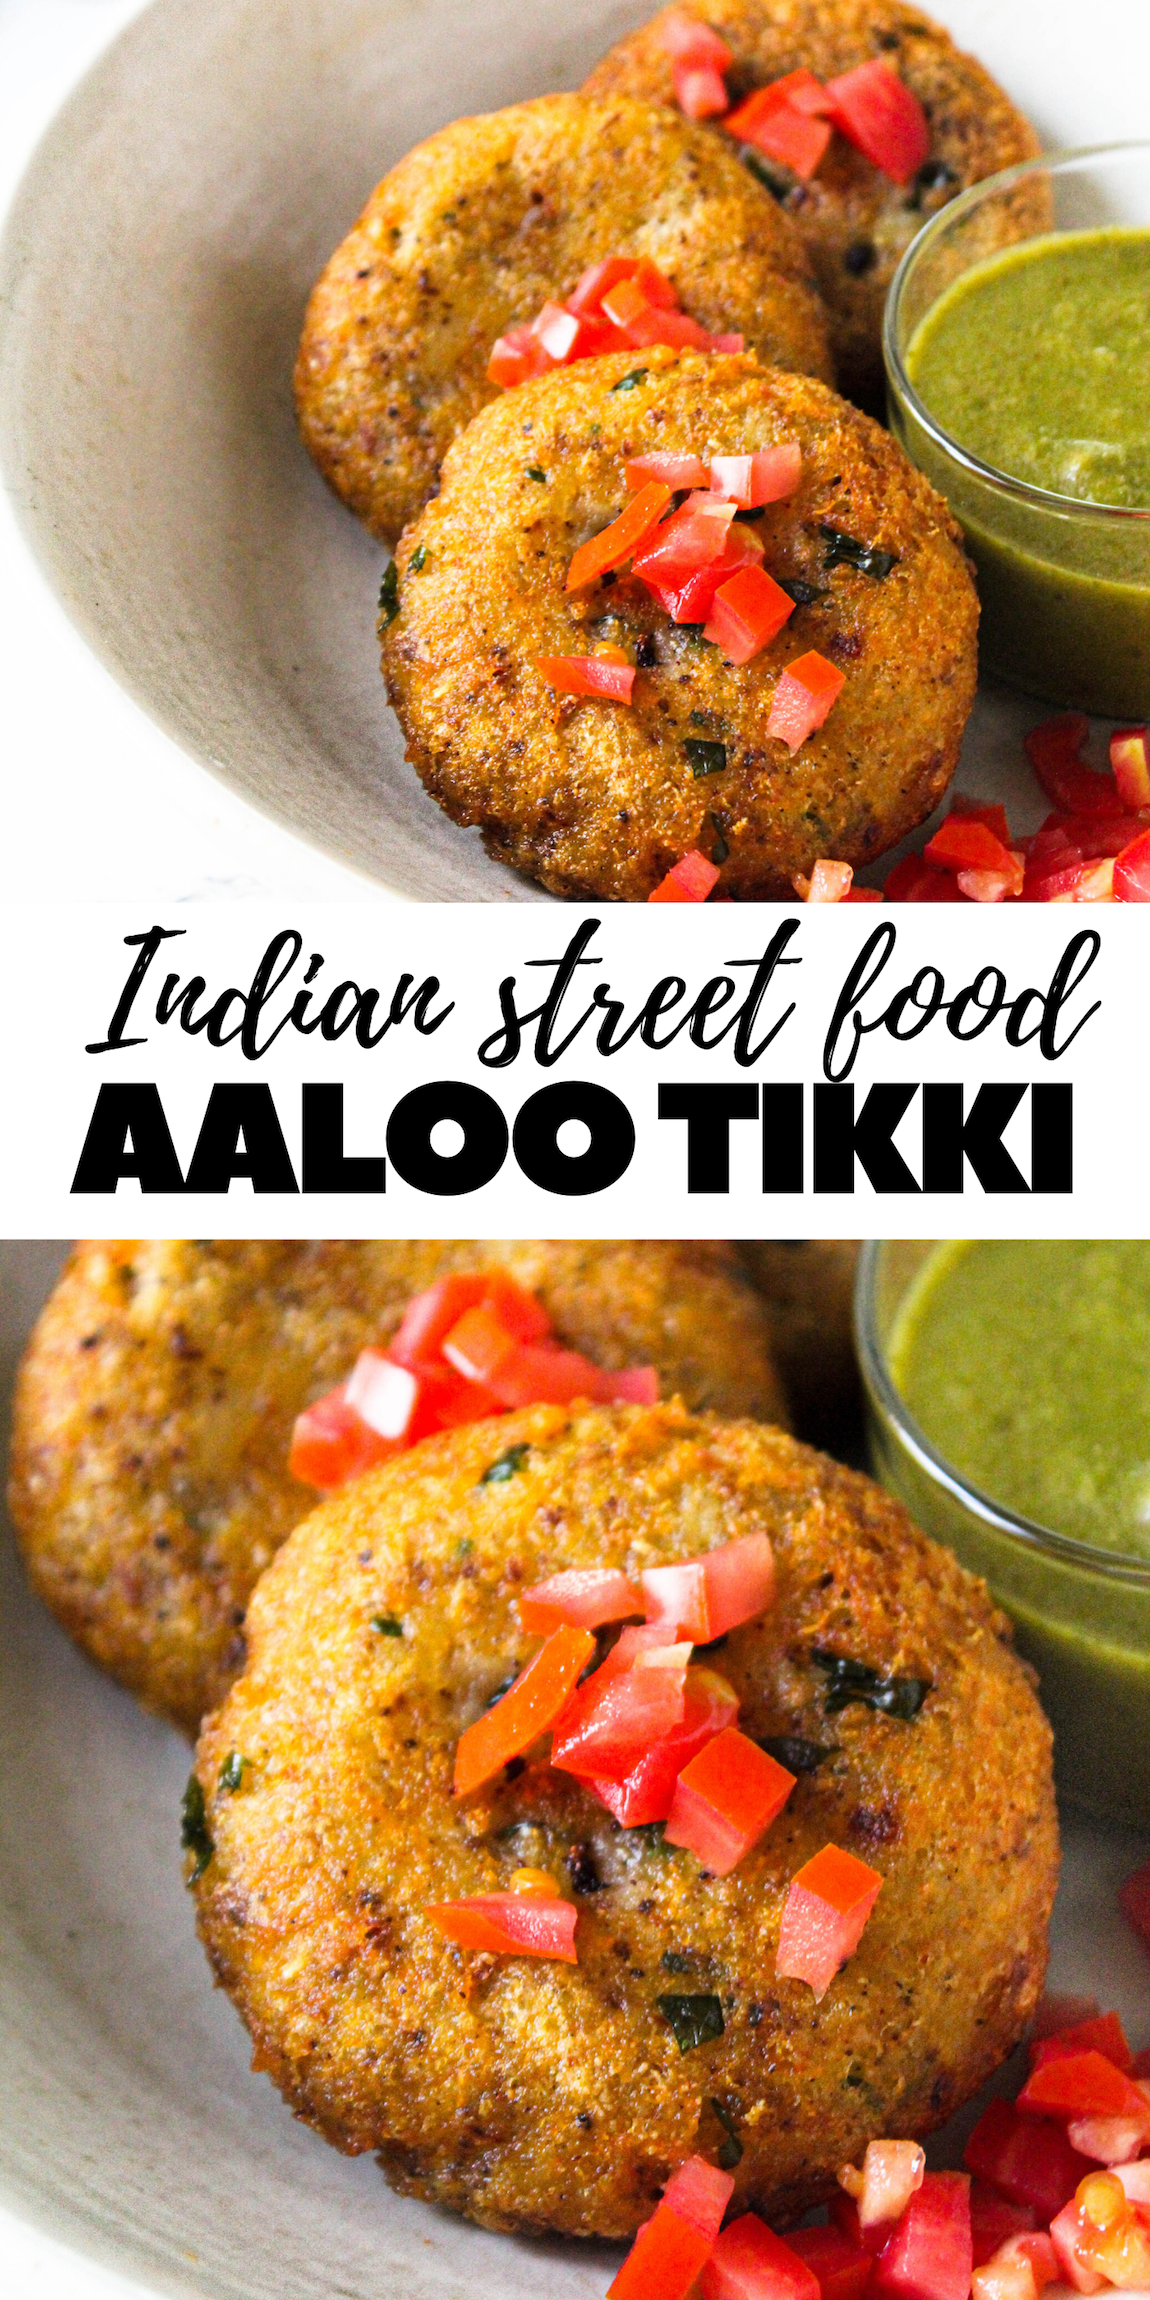 aaloo tikki indian street food the twin cooking project by sheenam muskaan recipe in on hebbar s kitchen recipes aloo tikki id=32019